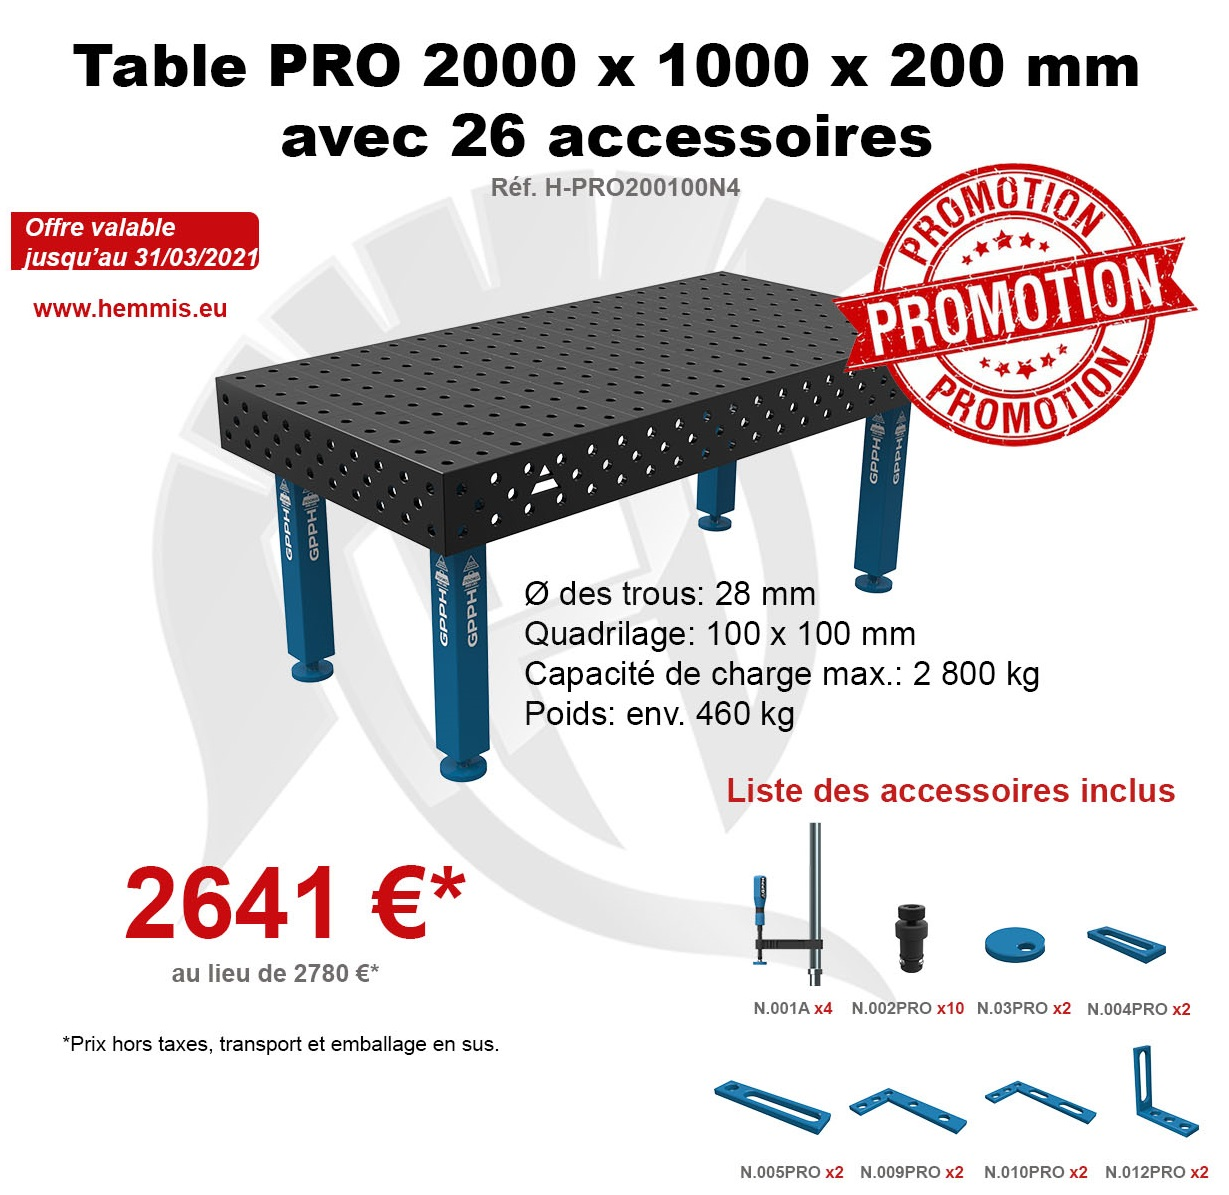 promotion table PRO 1er trimestre